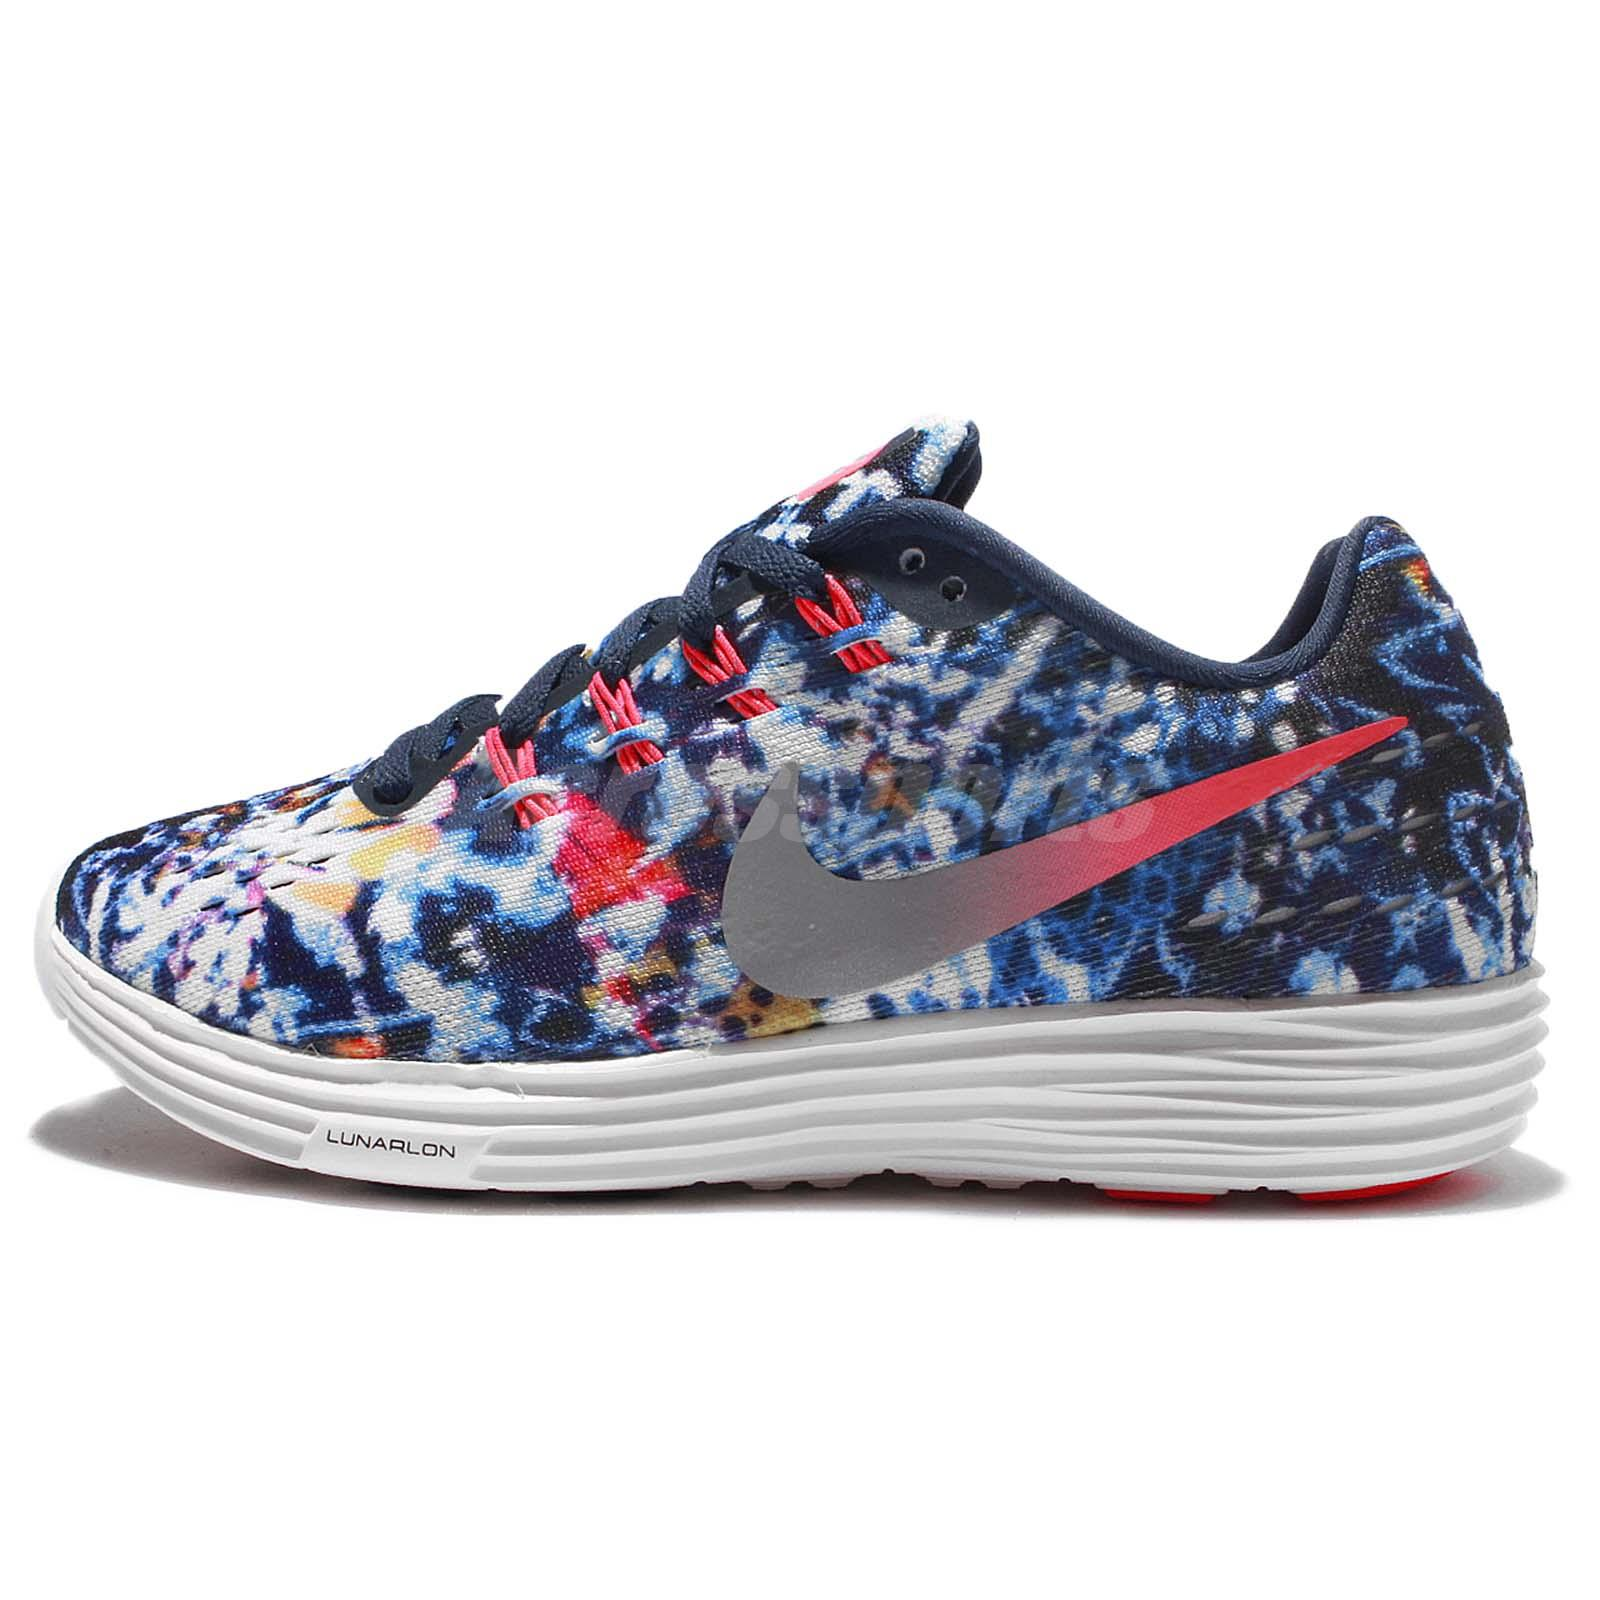 best sneakers d1869 c3f59 Nike Wmns Lunartempo 2 RF E II Jungle Pack Navy Women Running Shoes  849815-600